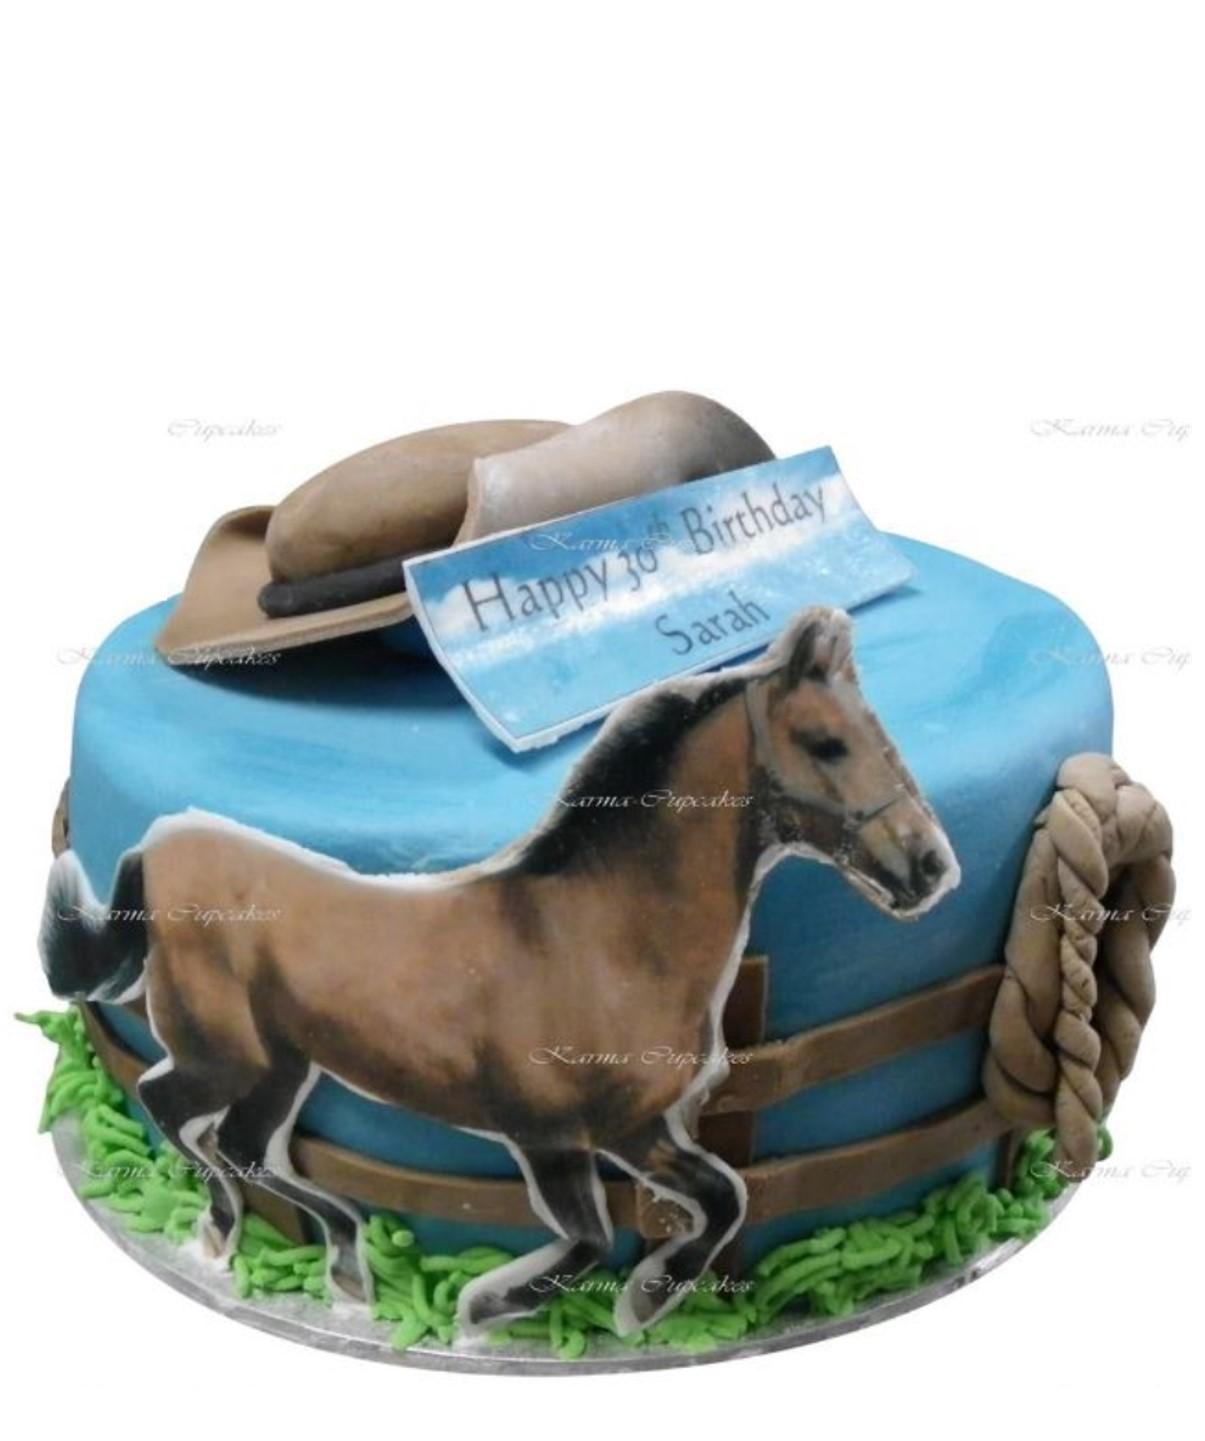 Edible Image cakes using photos and logos